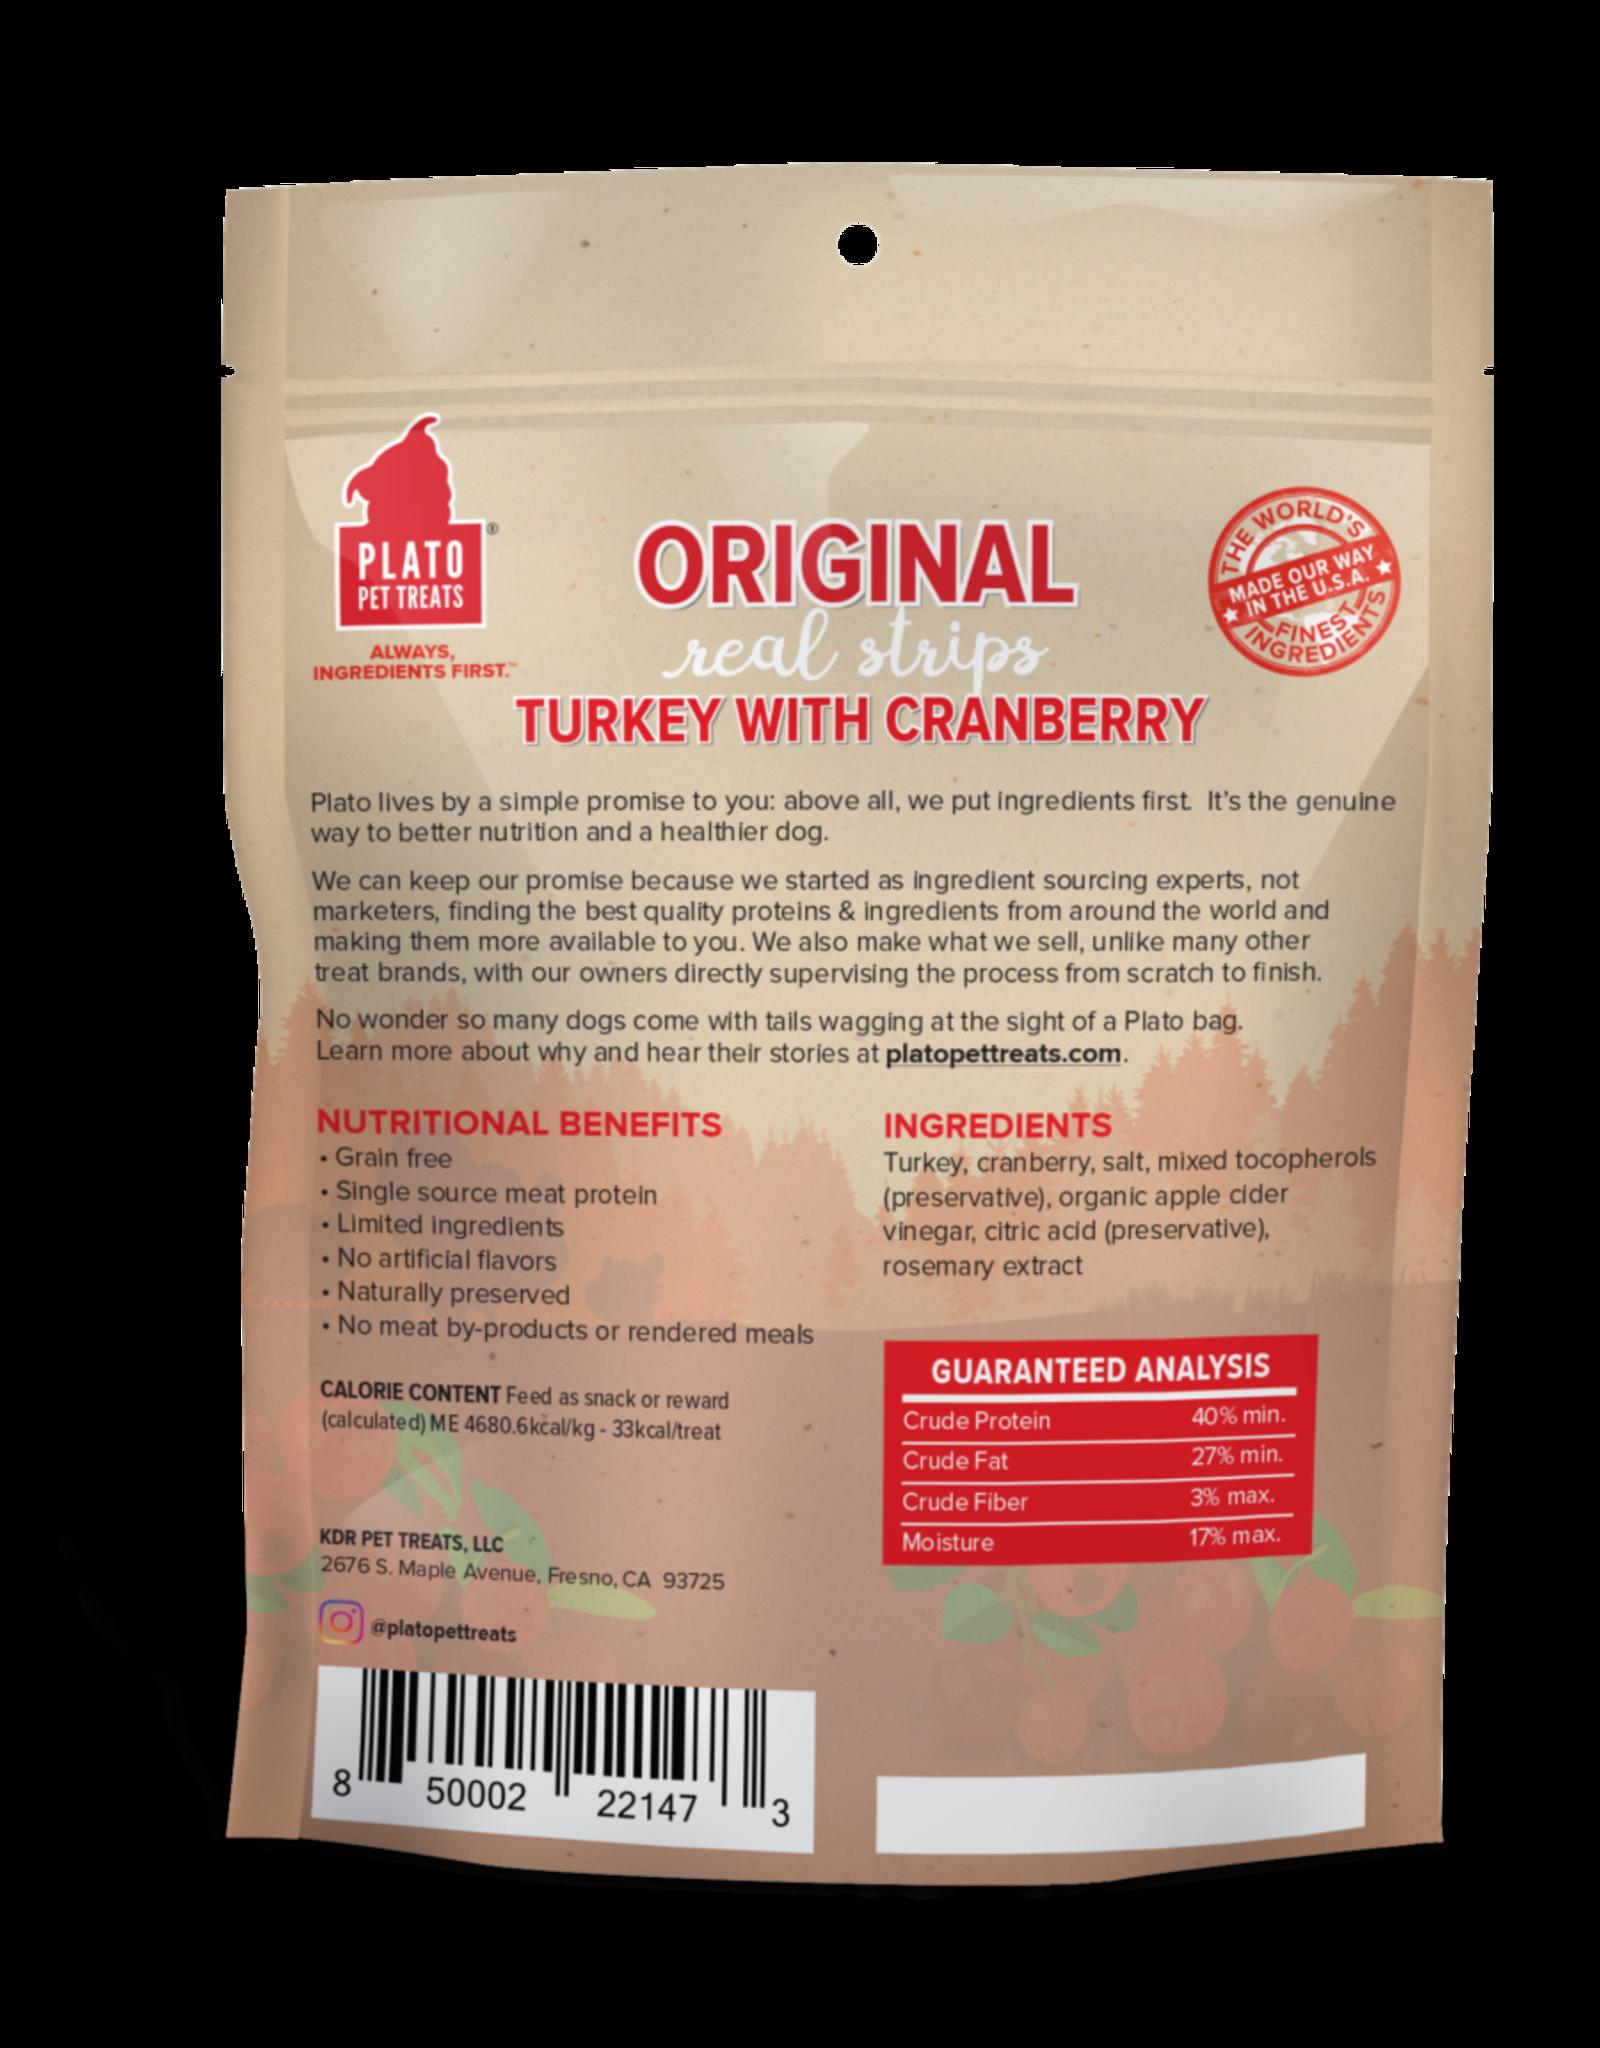 Plato Pet Treats Plato Turkey with Cranberry Strips